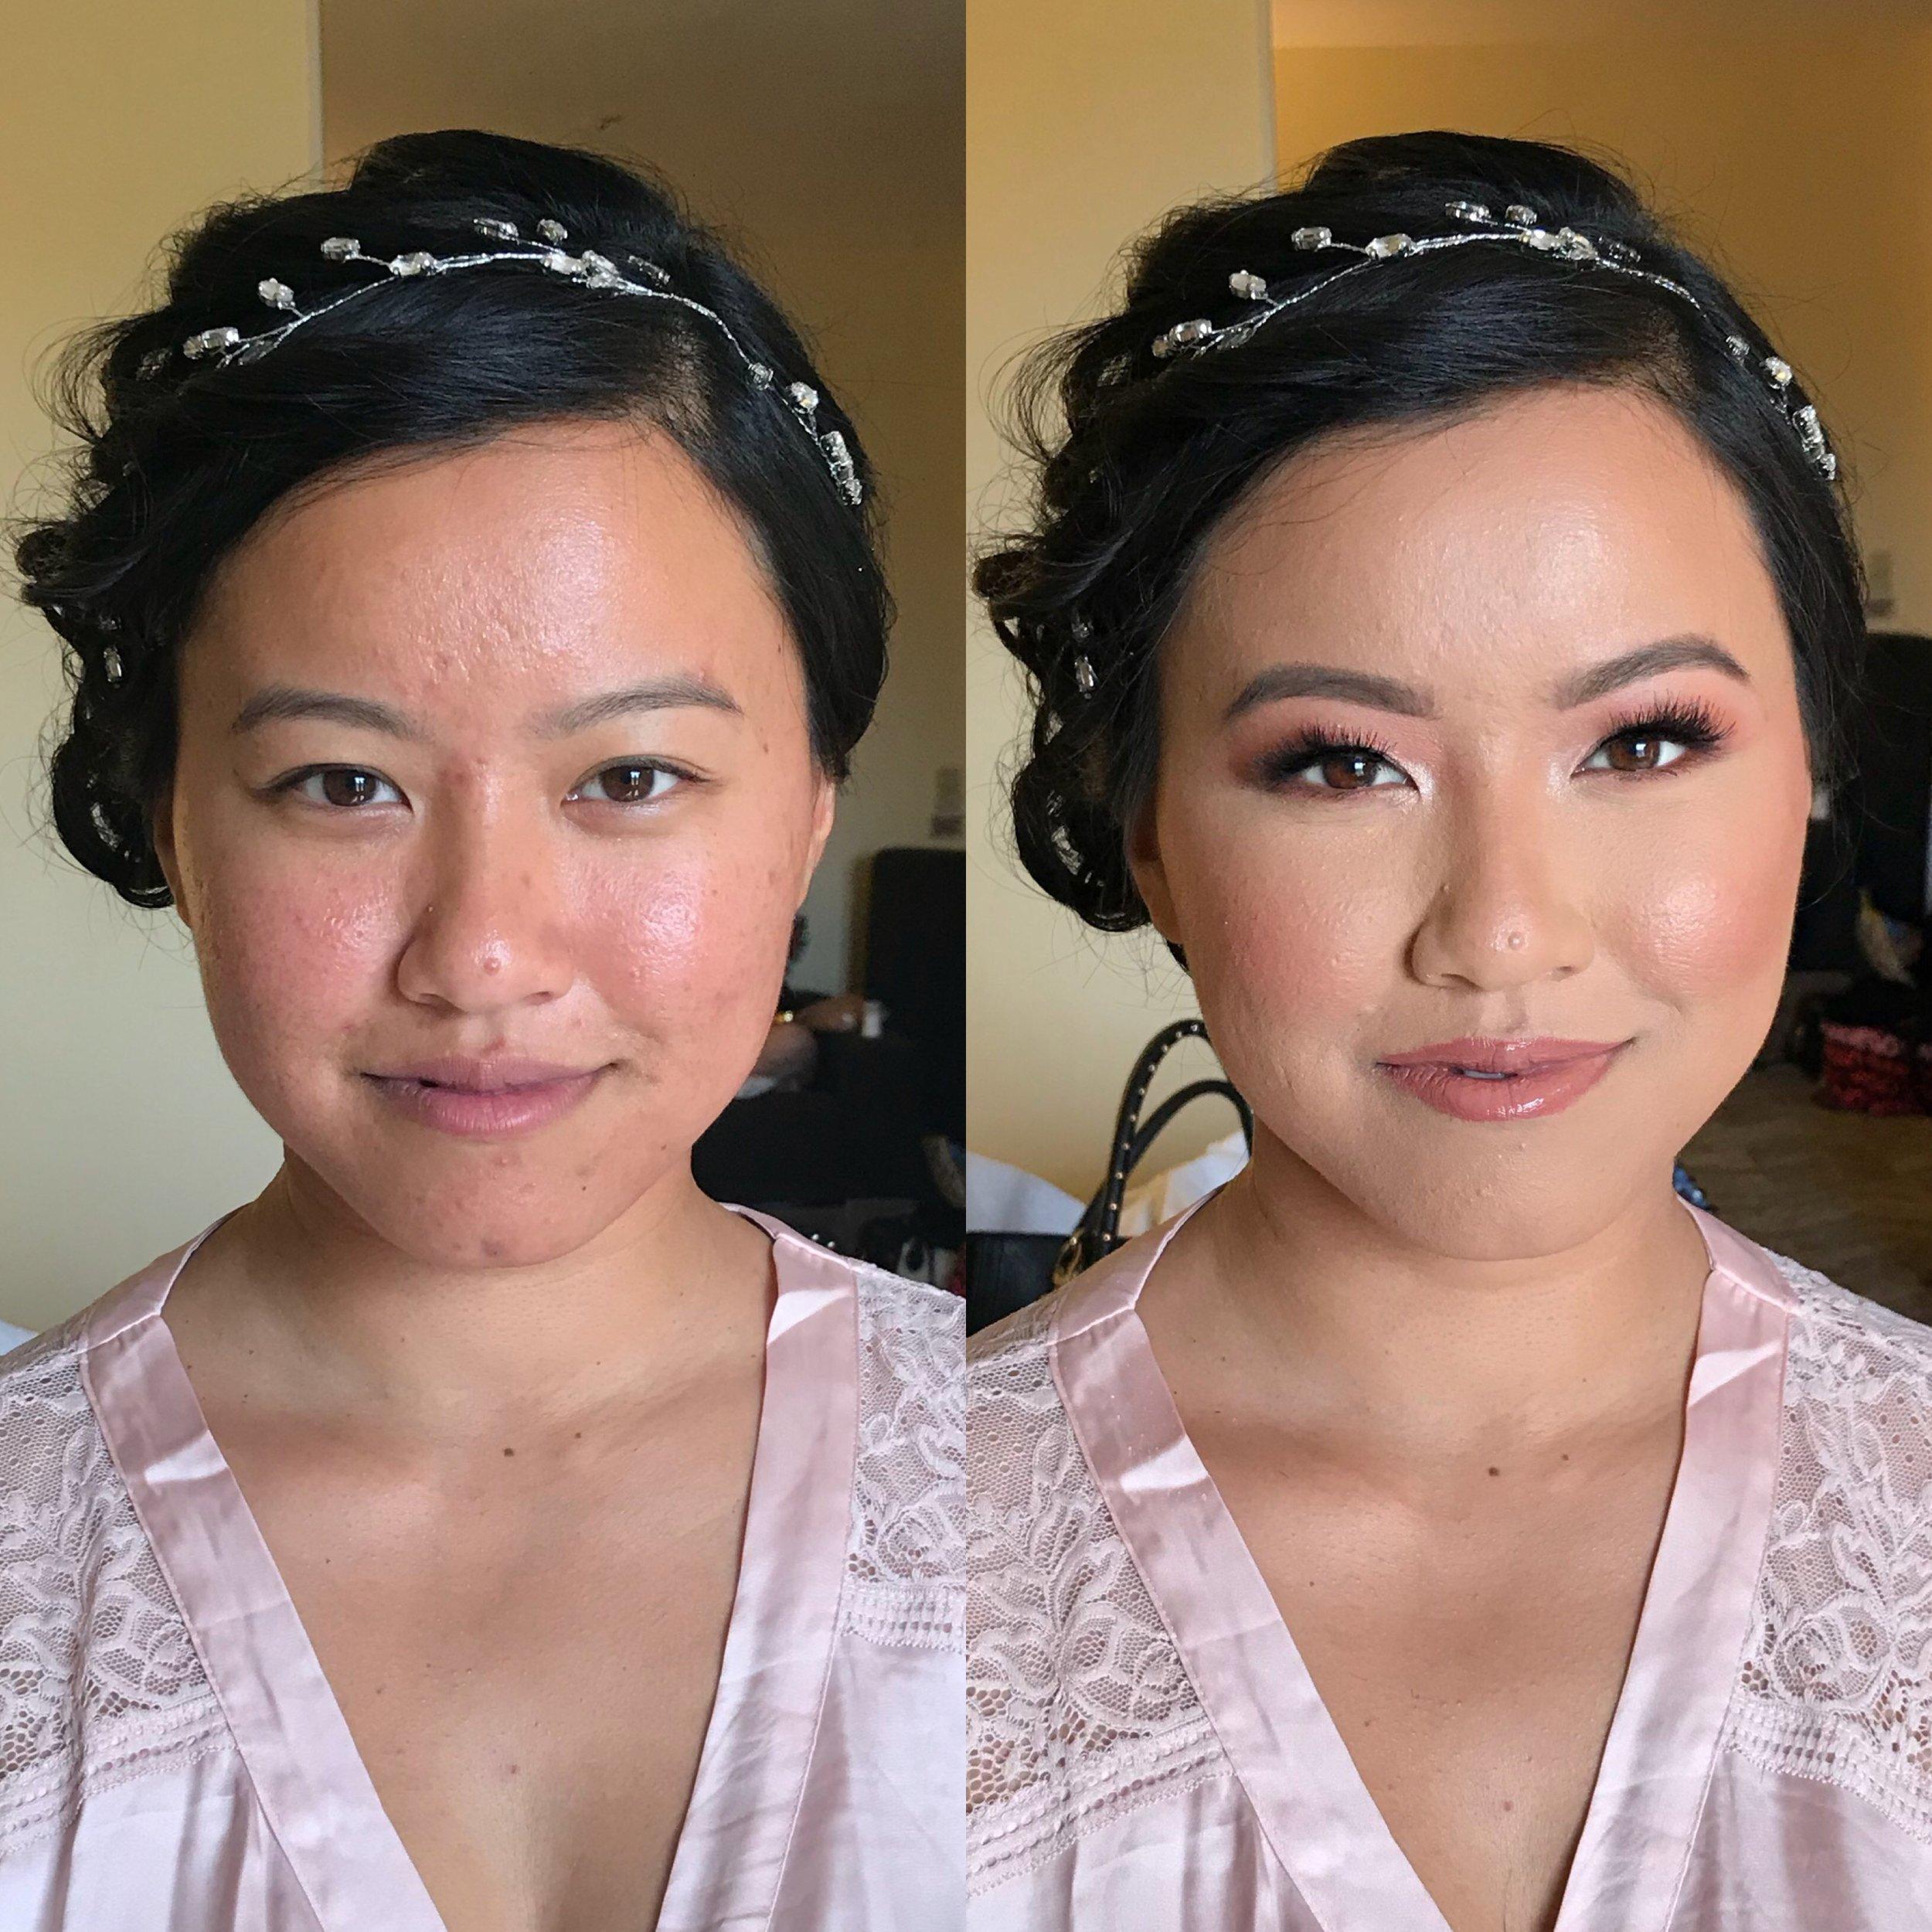 Patricia_Castro_Makeup_Los_Angeles_Makeup_Artist_66.jpeg